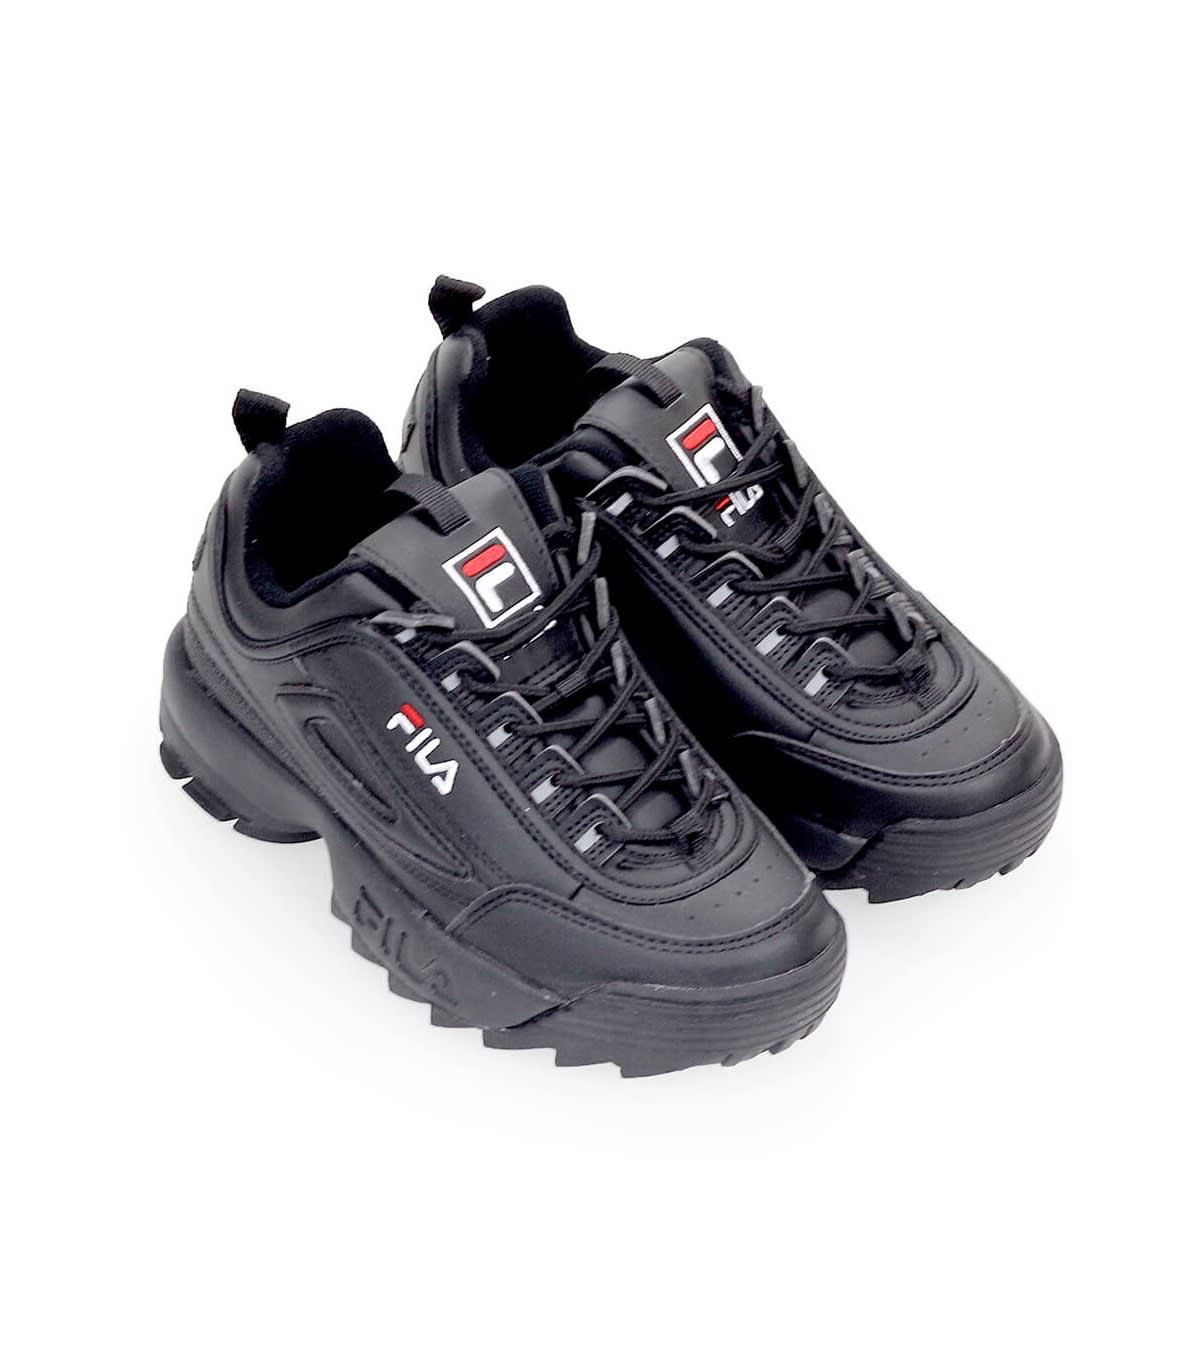 Fila Fila Disruptor Low Wmn Black Sneaker Nero 11170800